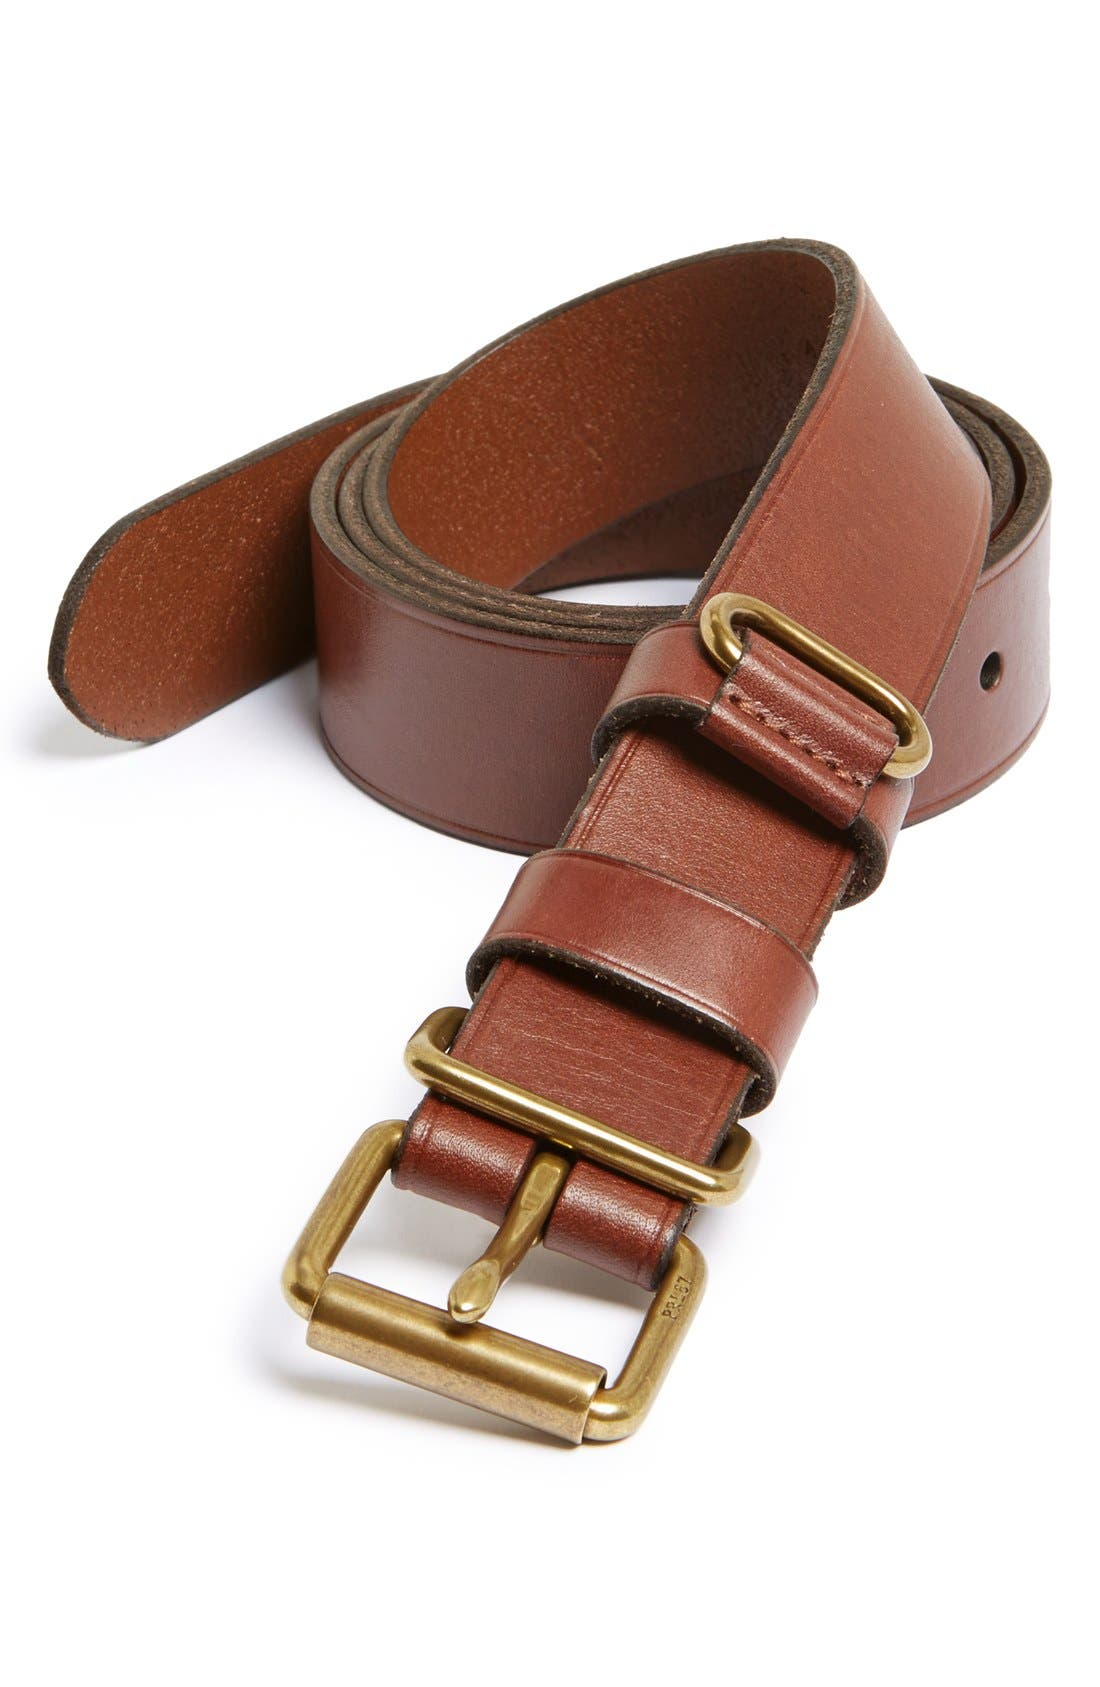 Main Image - Polo Ralph Lauren 'Suffolk' Leather Belt